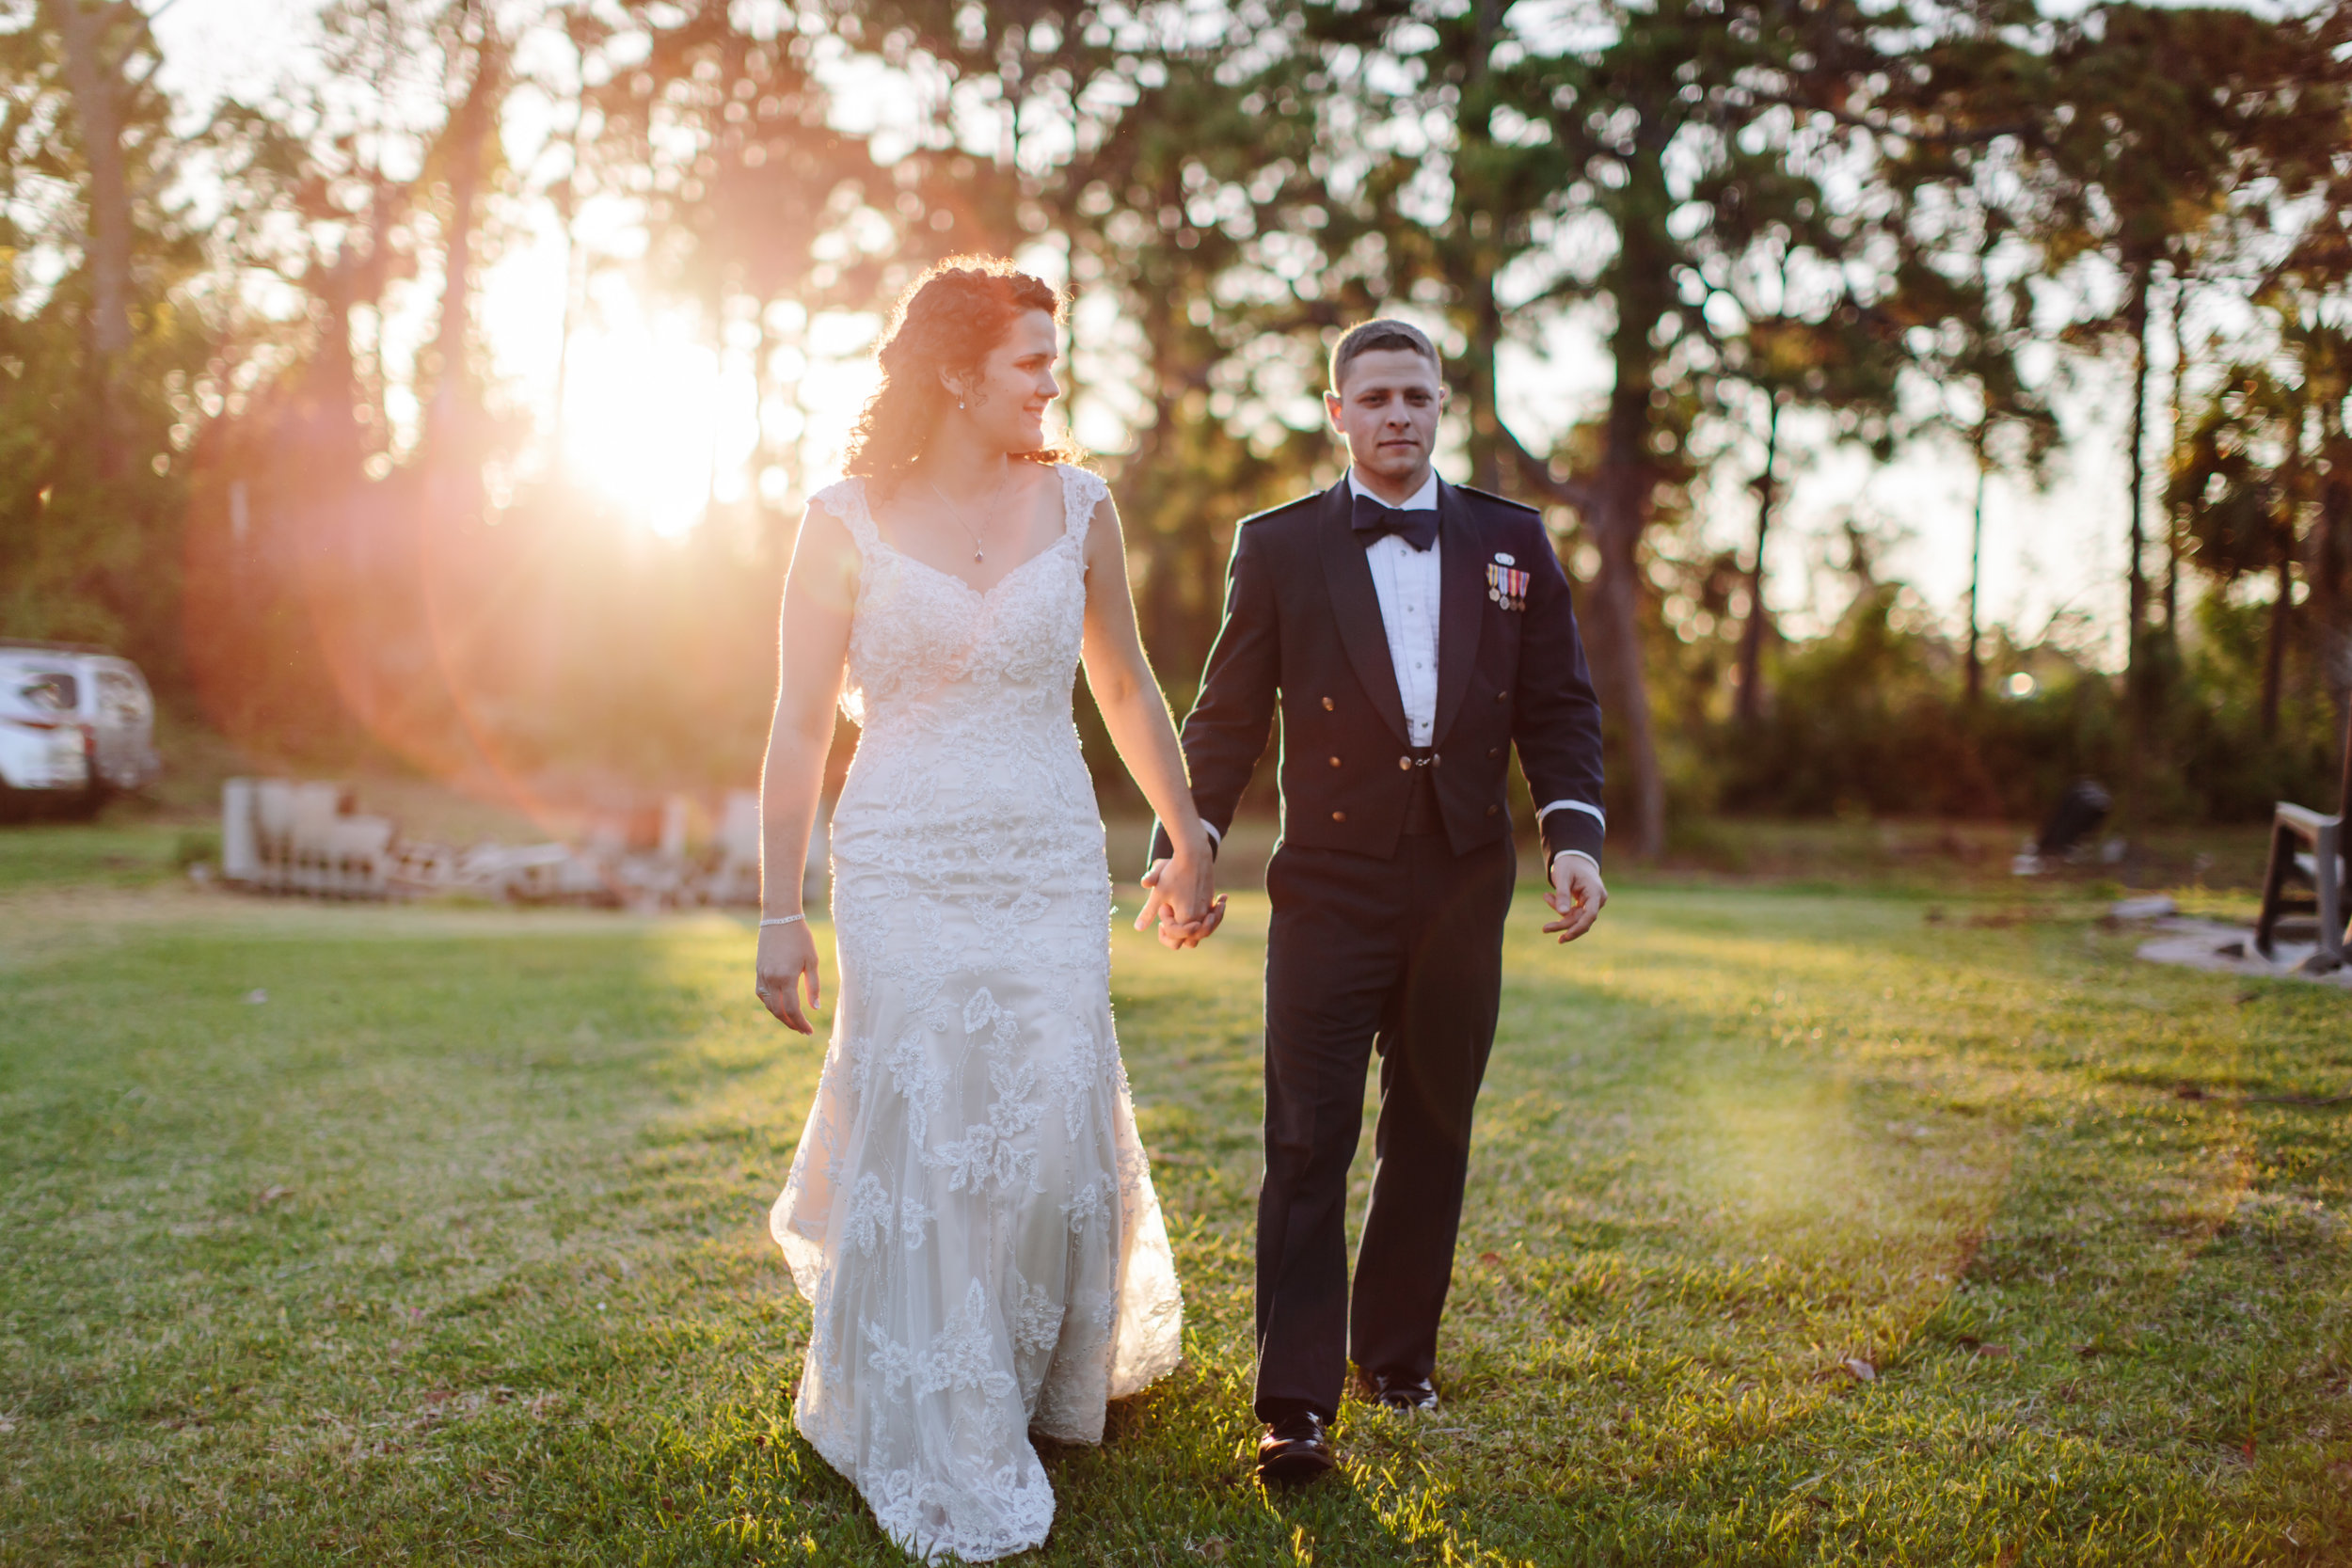 2018.03.17 Allison and Chuck Wedding Waelti Melbourne (773 of 569).jpg